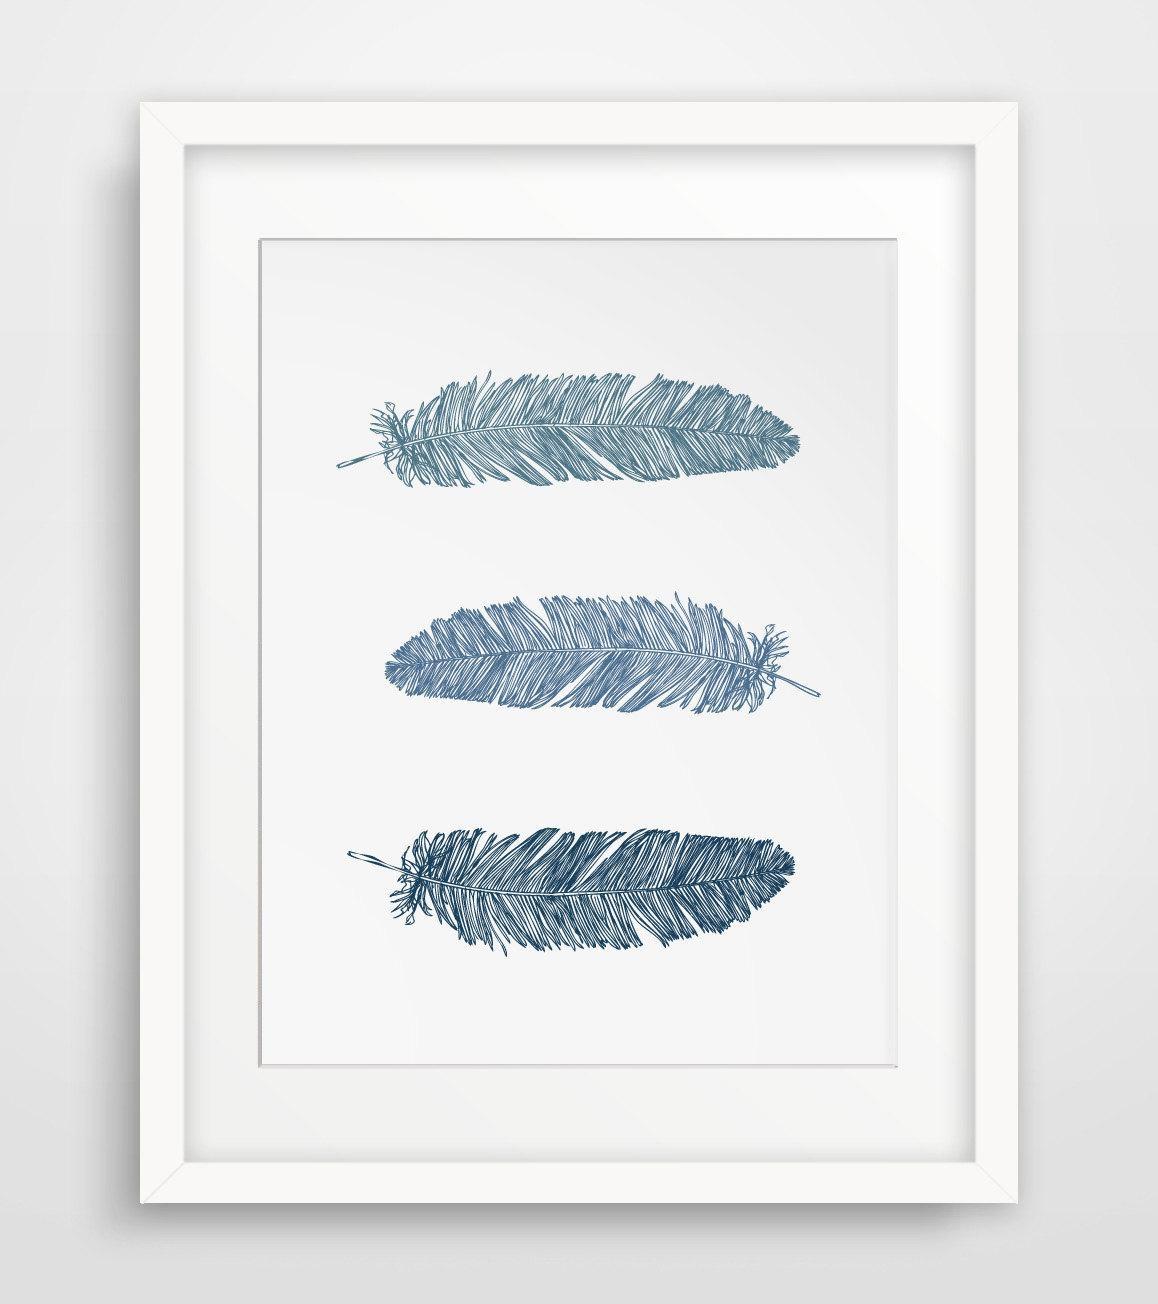 Wall Art Designs: Printable Wall Art Follow Your Dreams Black Regarding Blue Wall Art (View 11 of 20)